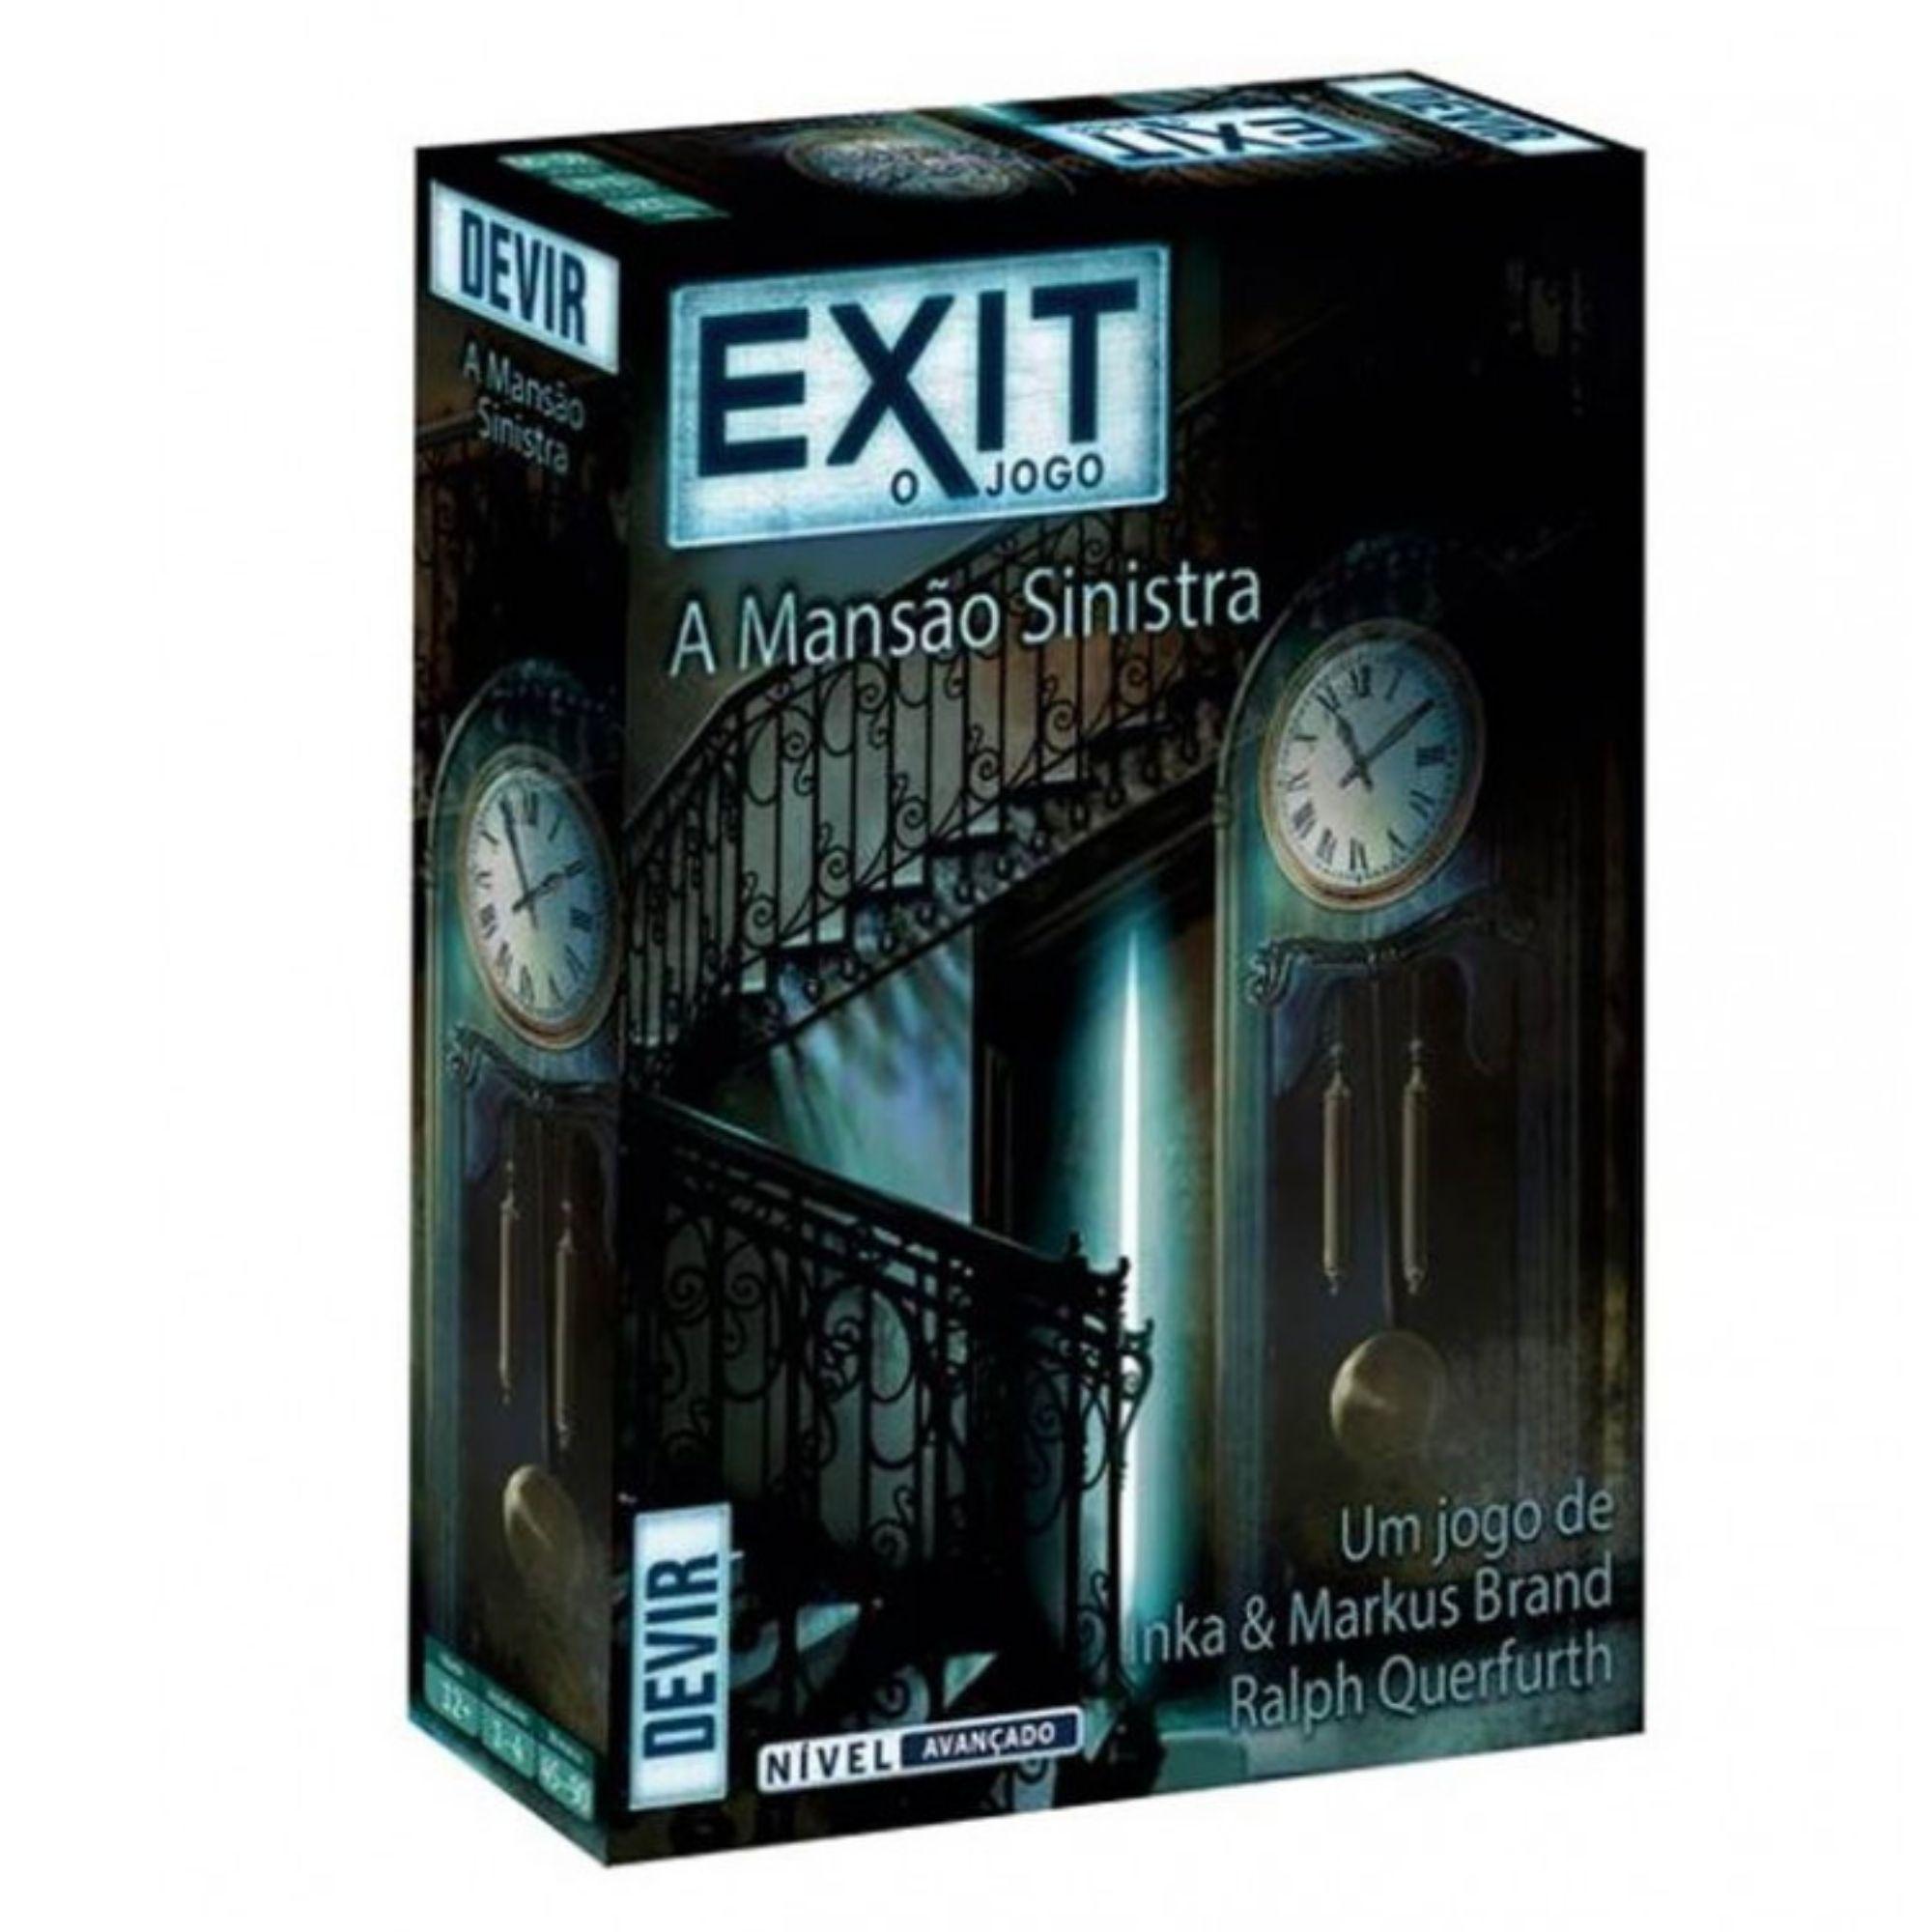 Exit, A Mansão Sinistra